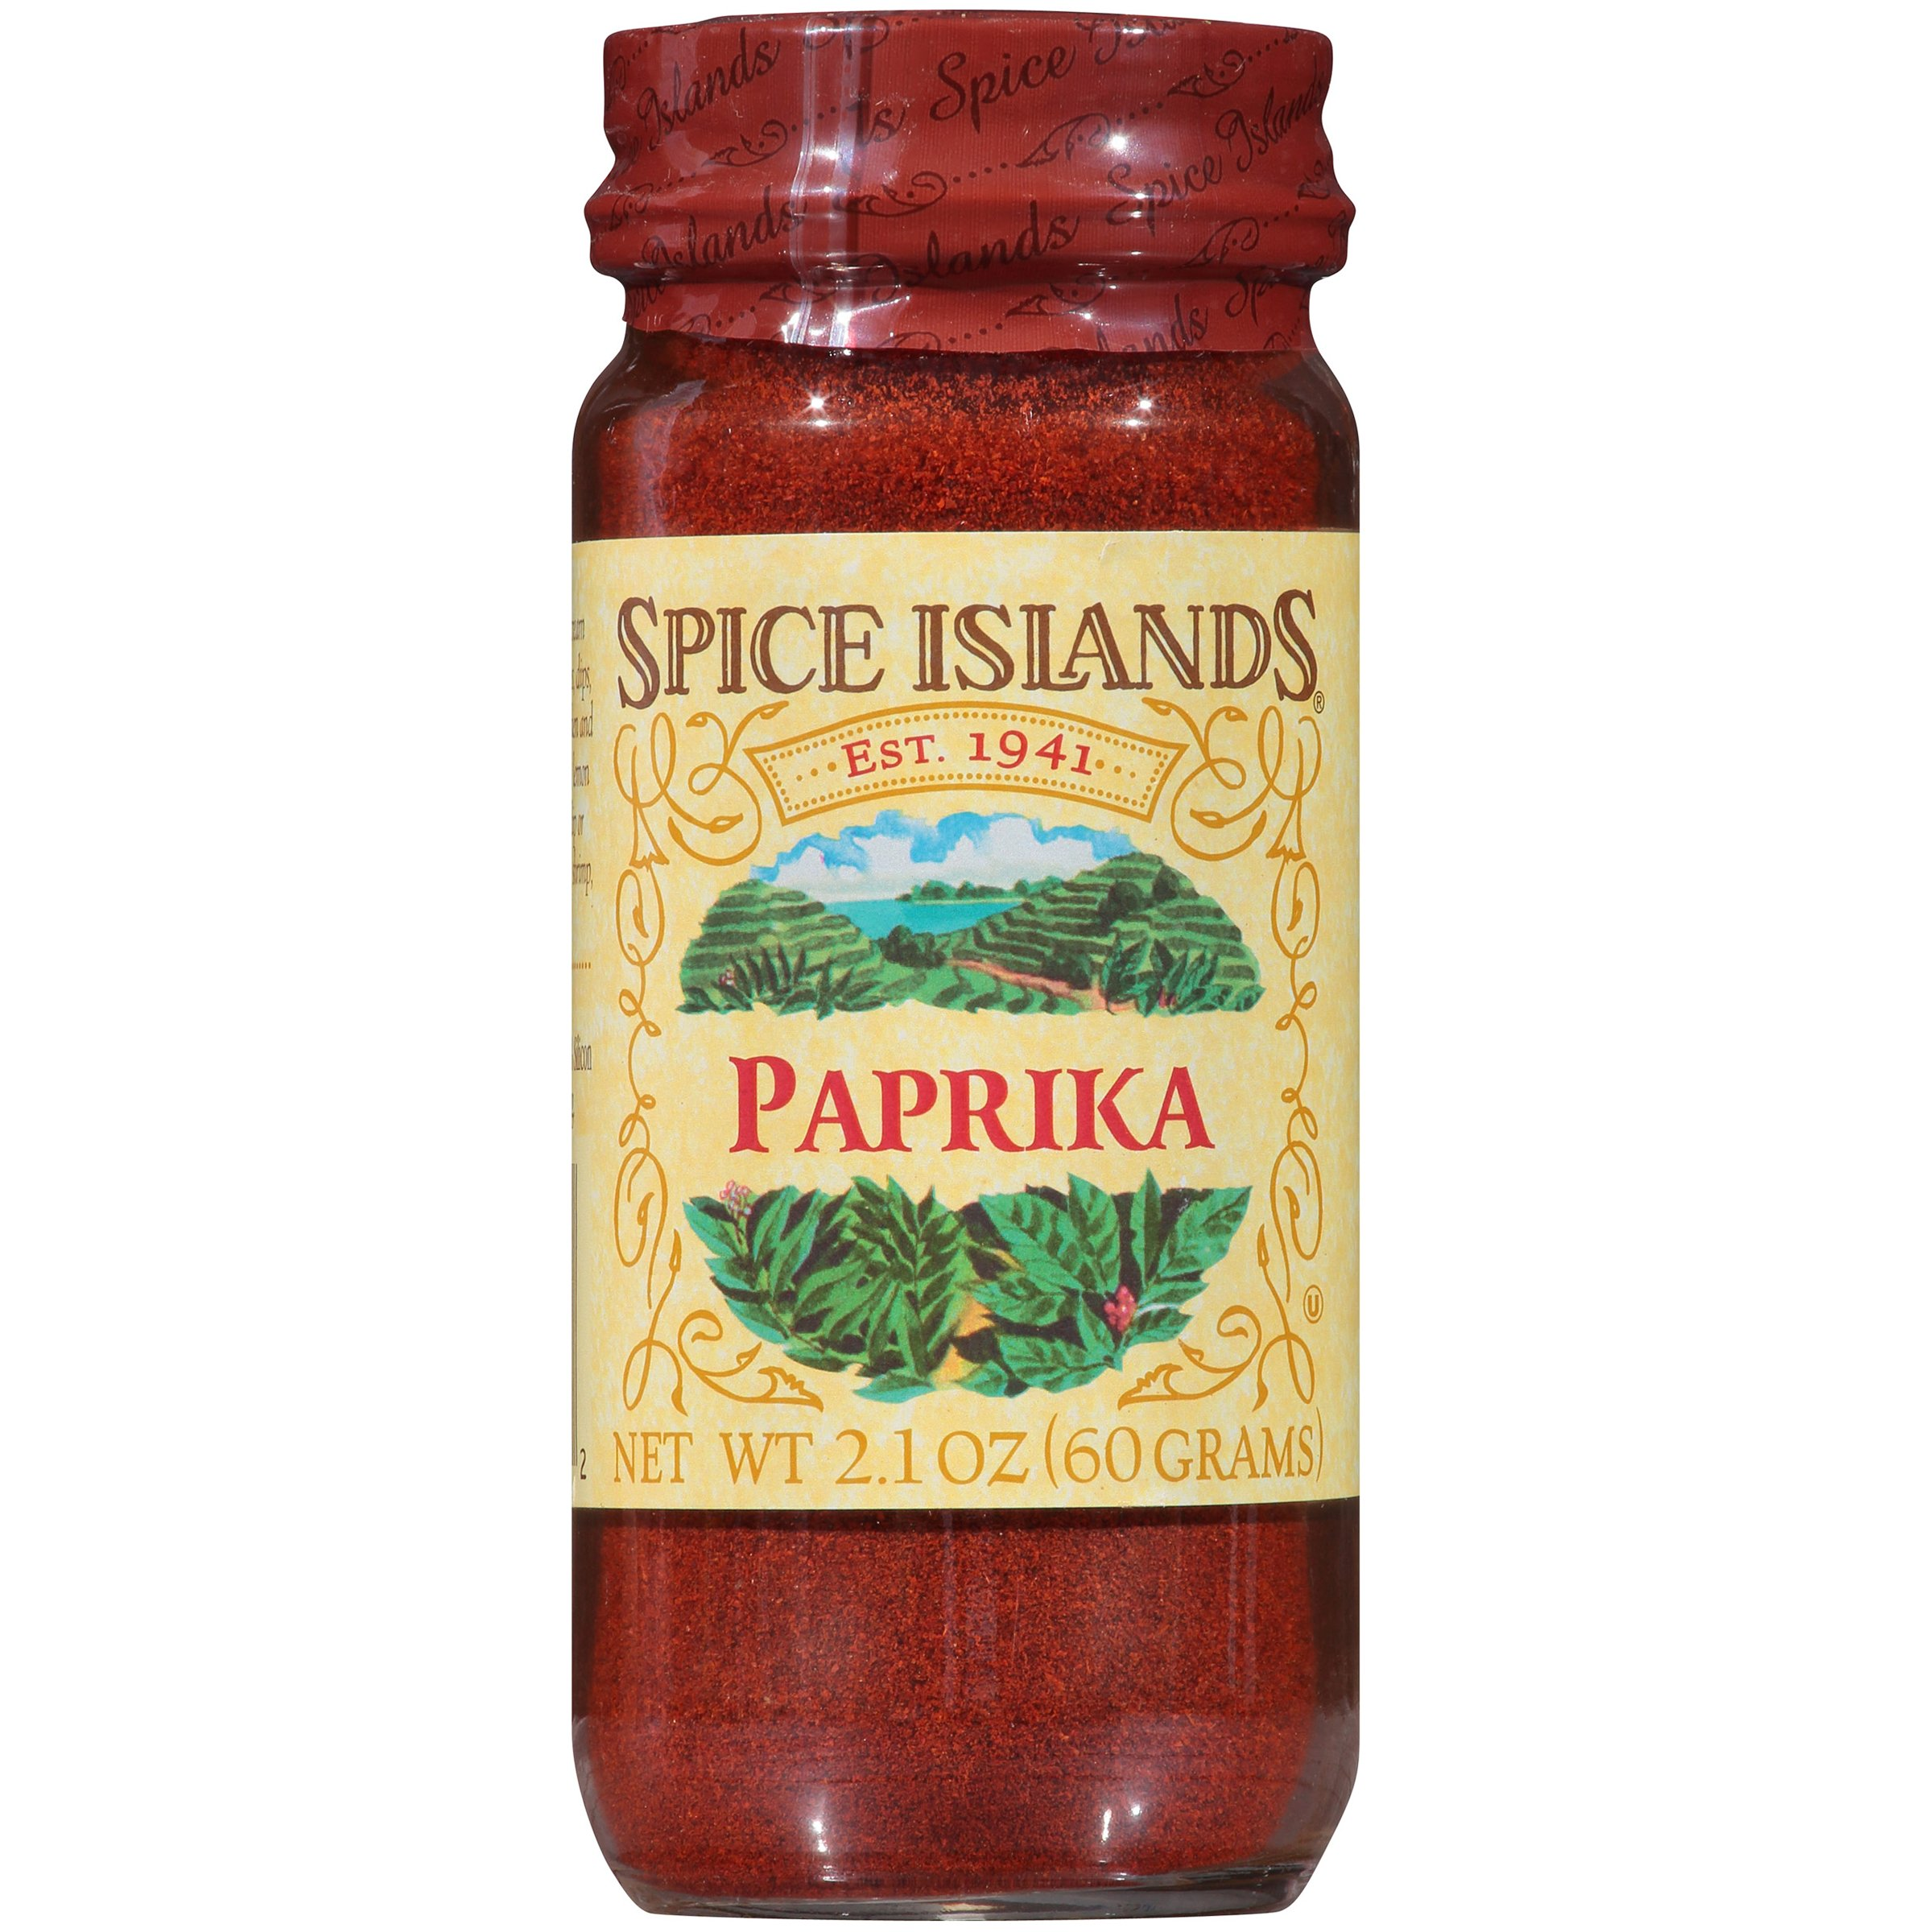 Spice Islands Paprika, 2.1 oz (Pack of 3) by Spice Islands (Image #1)